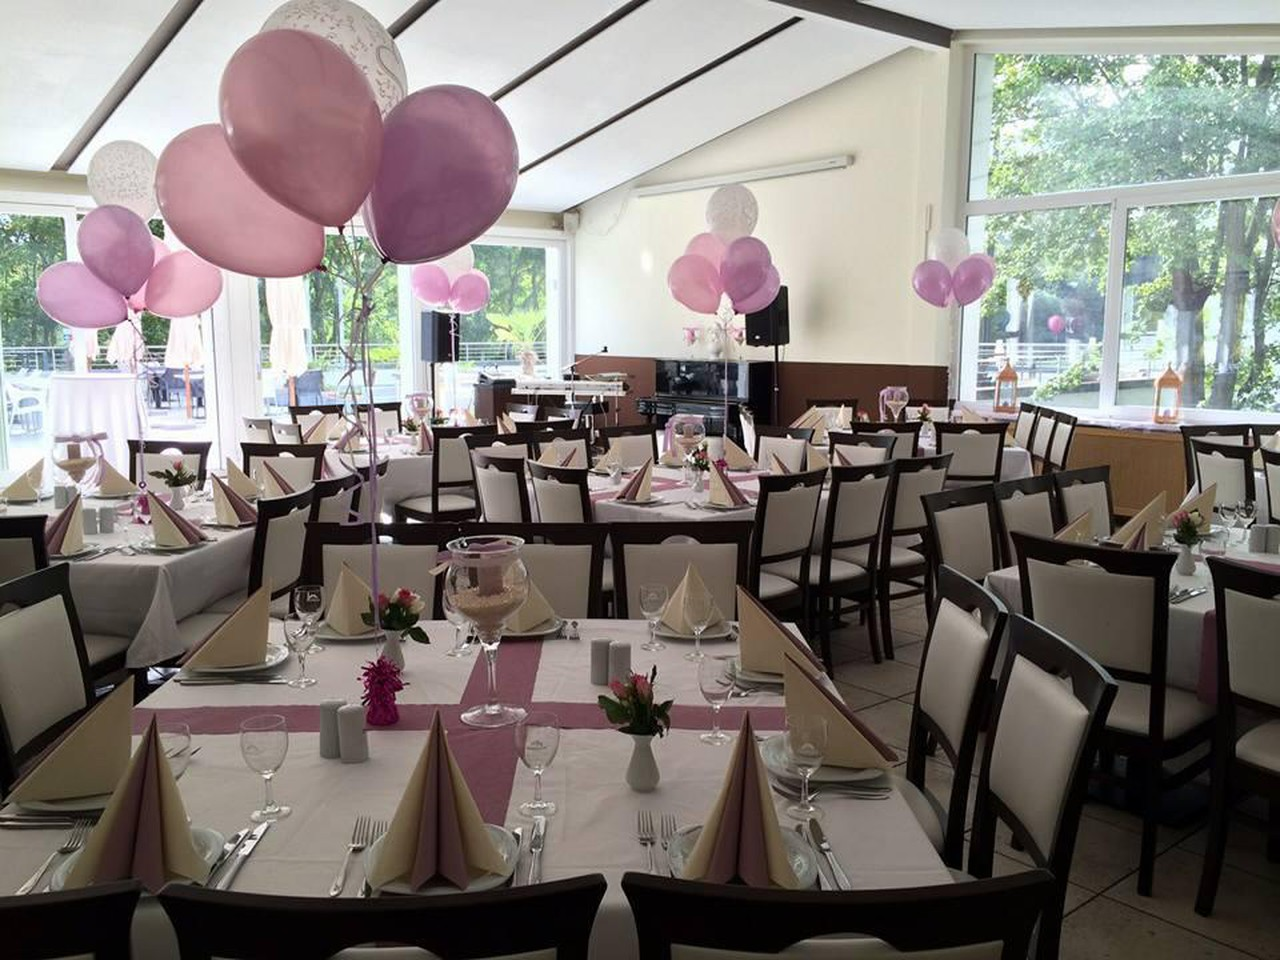 Fellbach PR & Marketing Event Restaurant Charisma Bootshaus  image 10